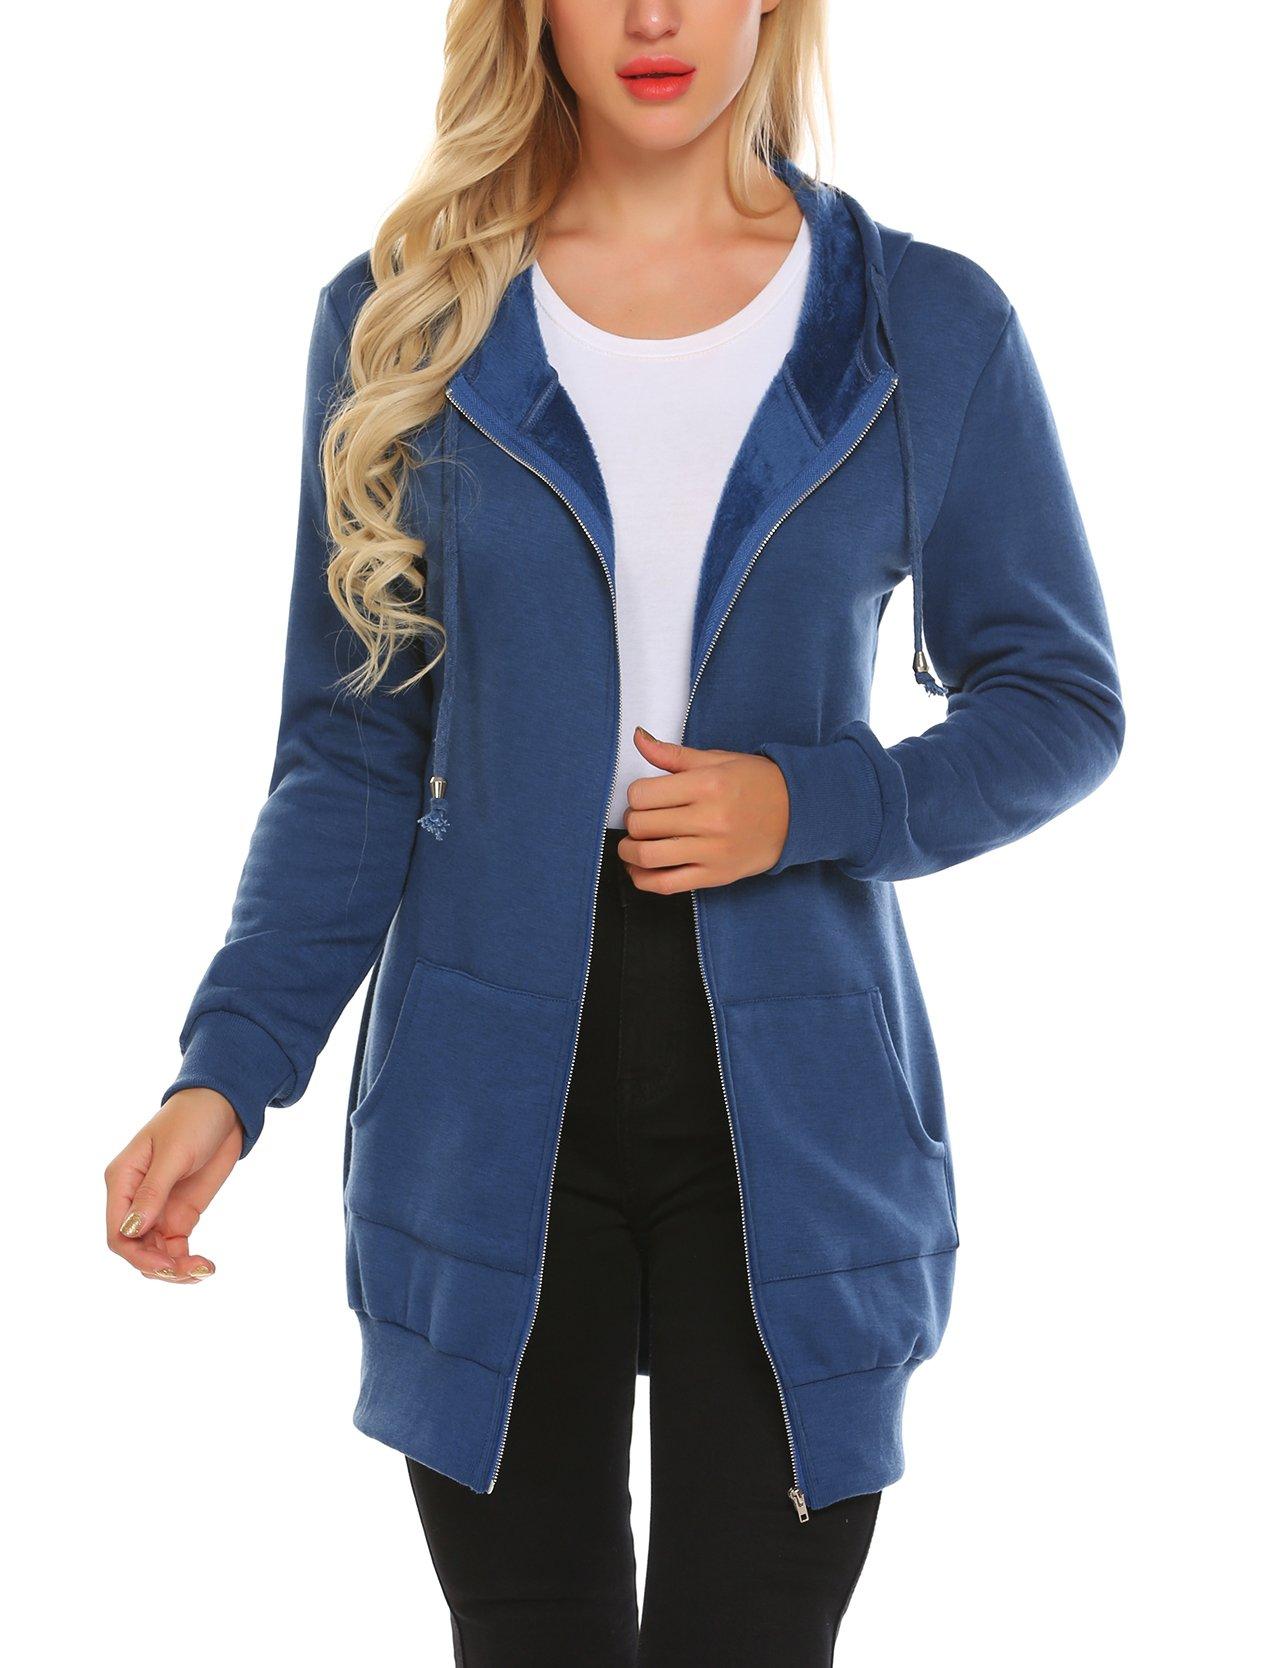 Zeagoo Women's Thin Cotton Zip Up Hoodie Jacket,Royal Blue,S